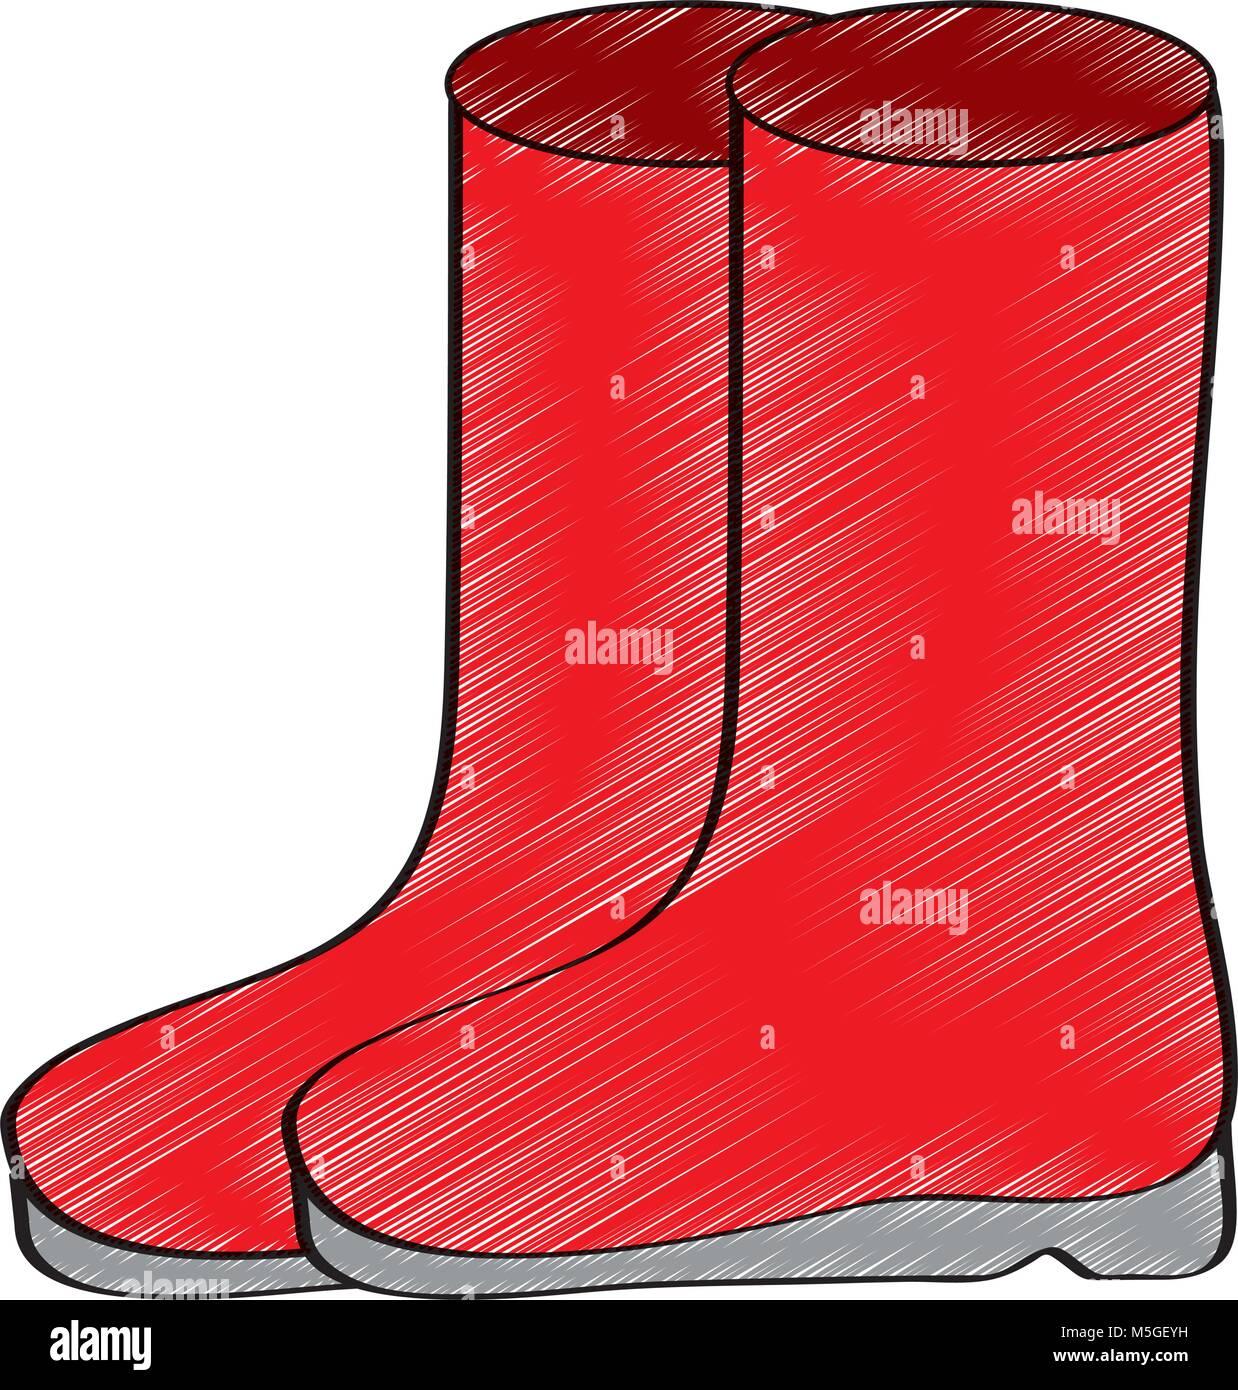 Pair Rubber Boots Clothes Winter Season Fashion Stock Vector